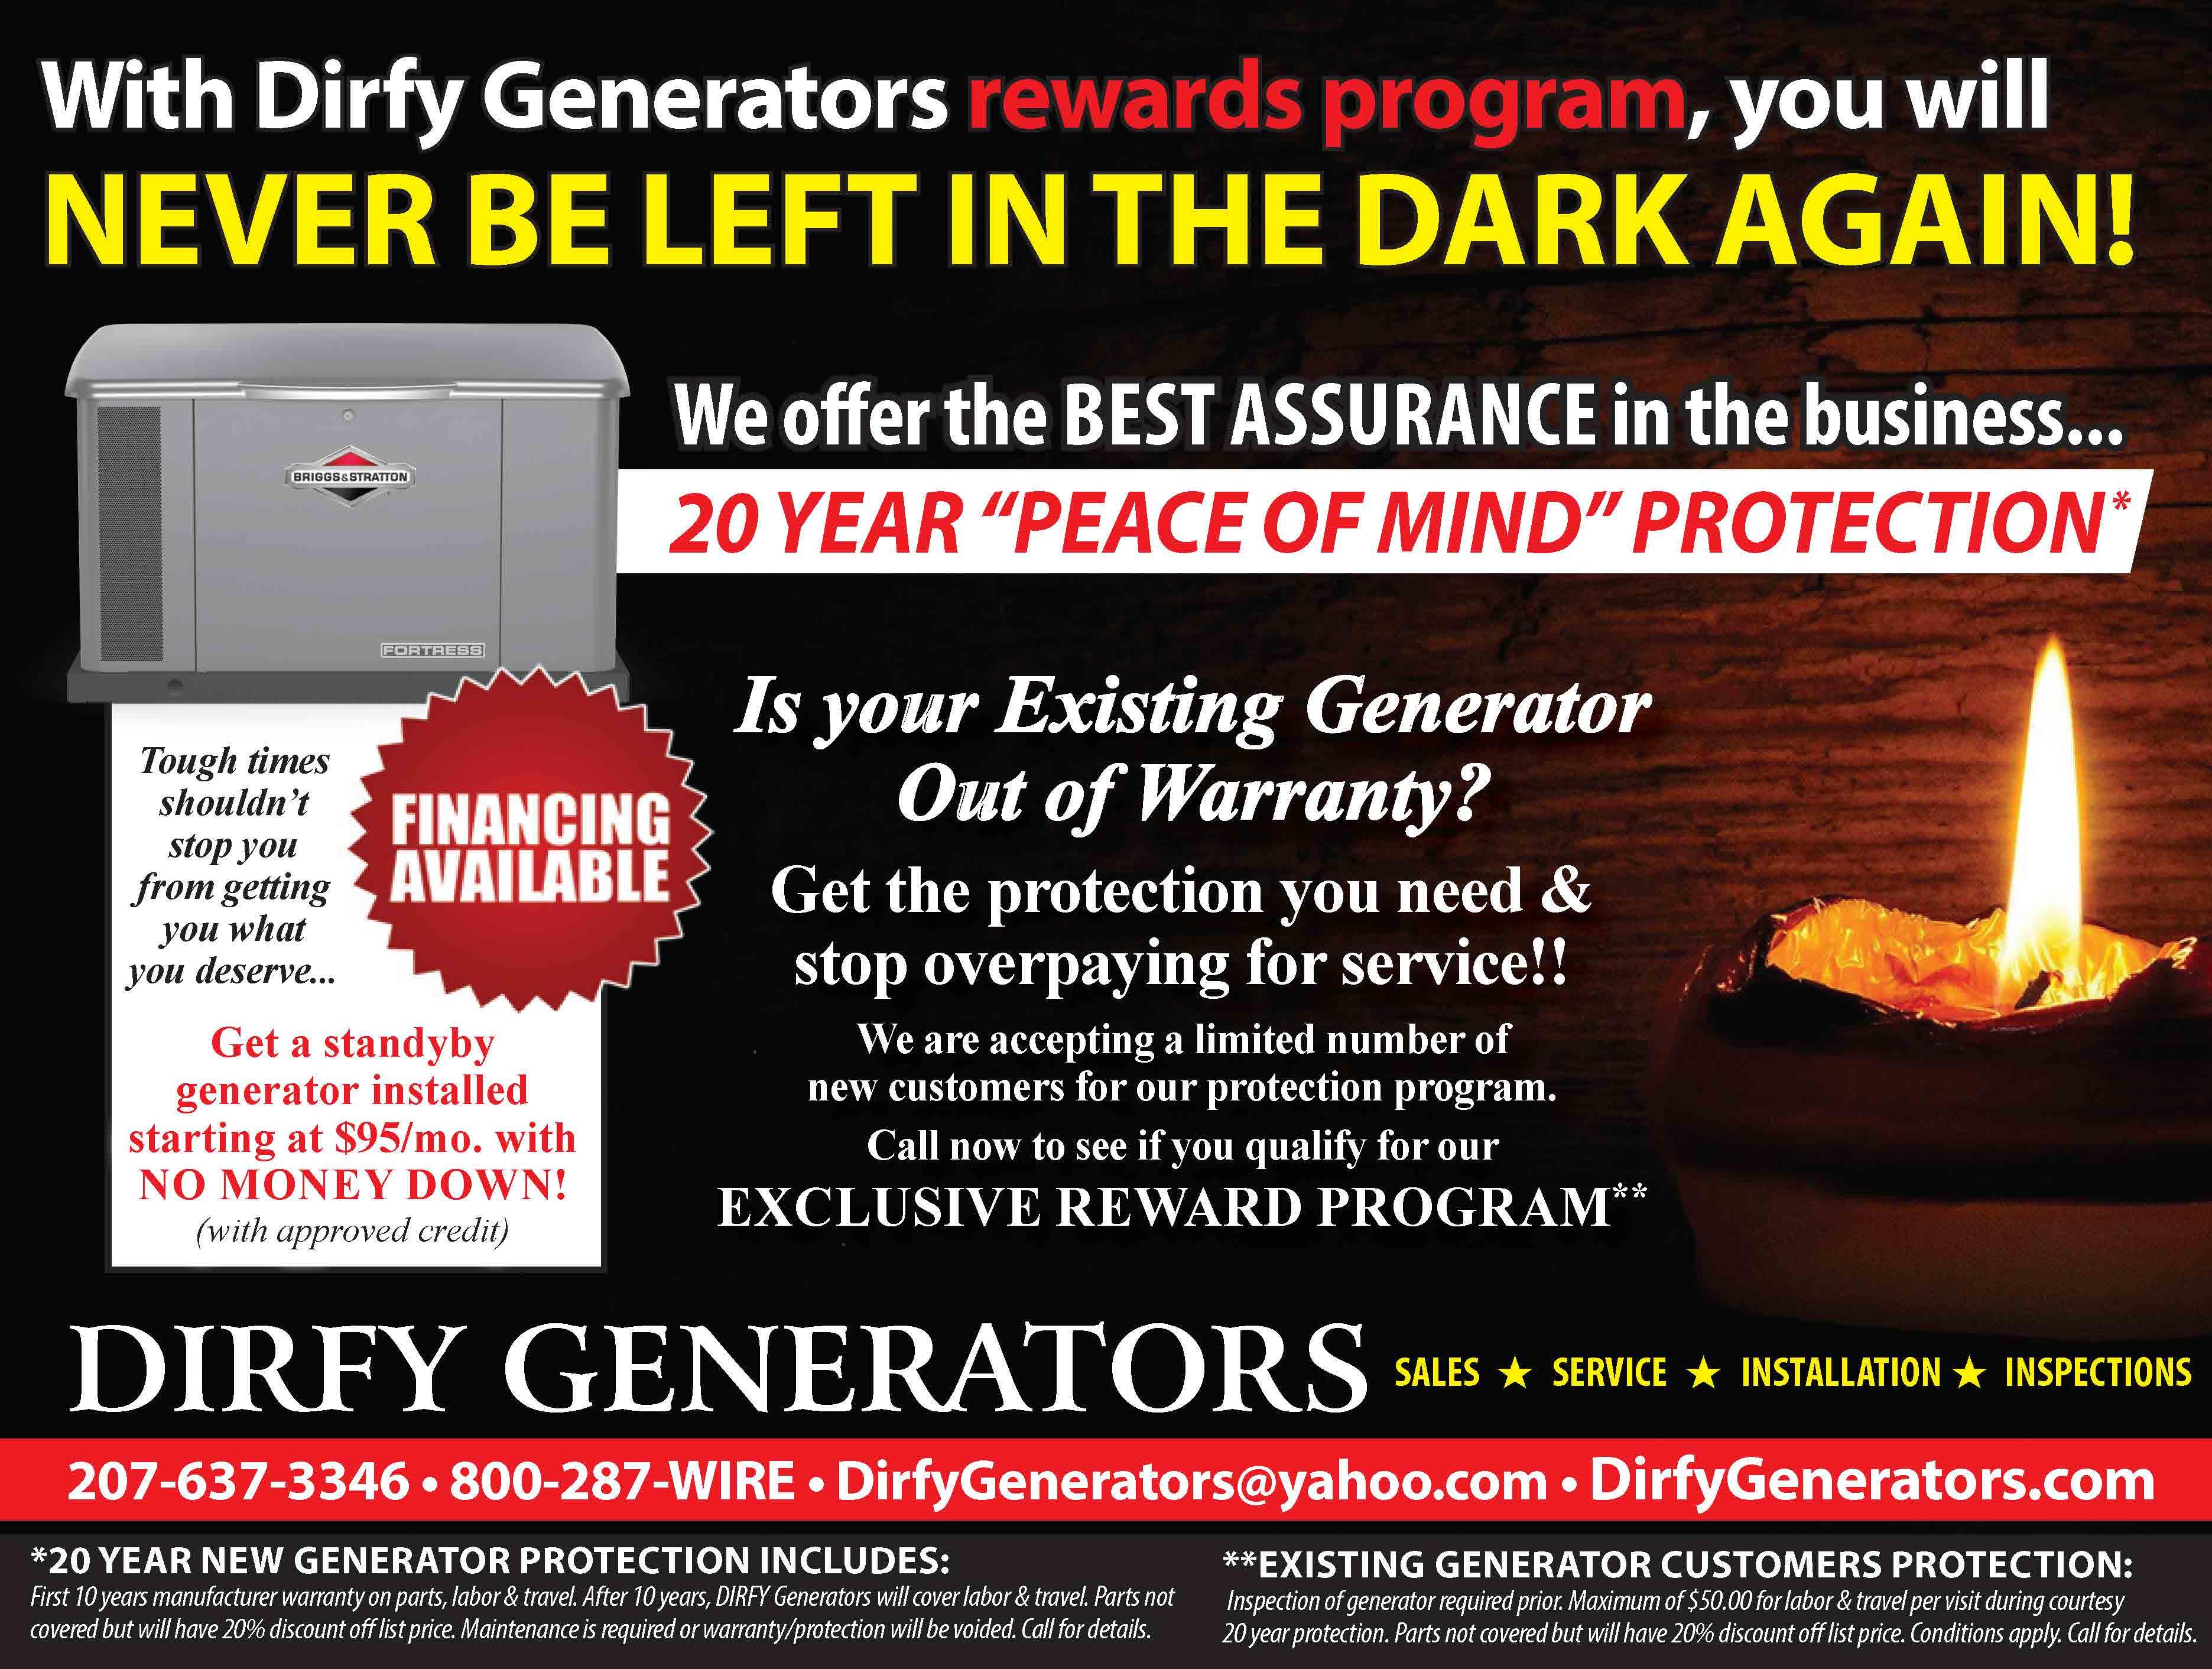 http://www.dirfygenerators.com/